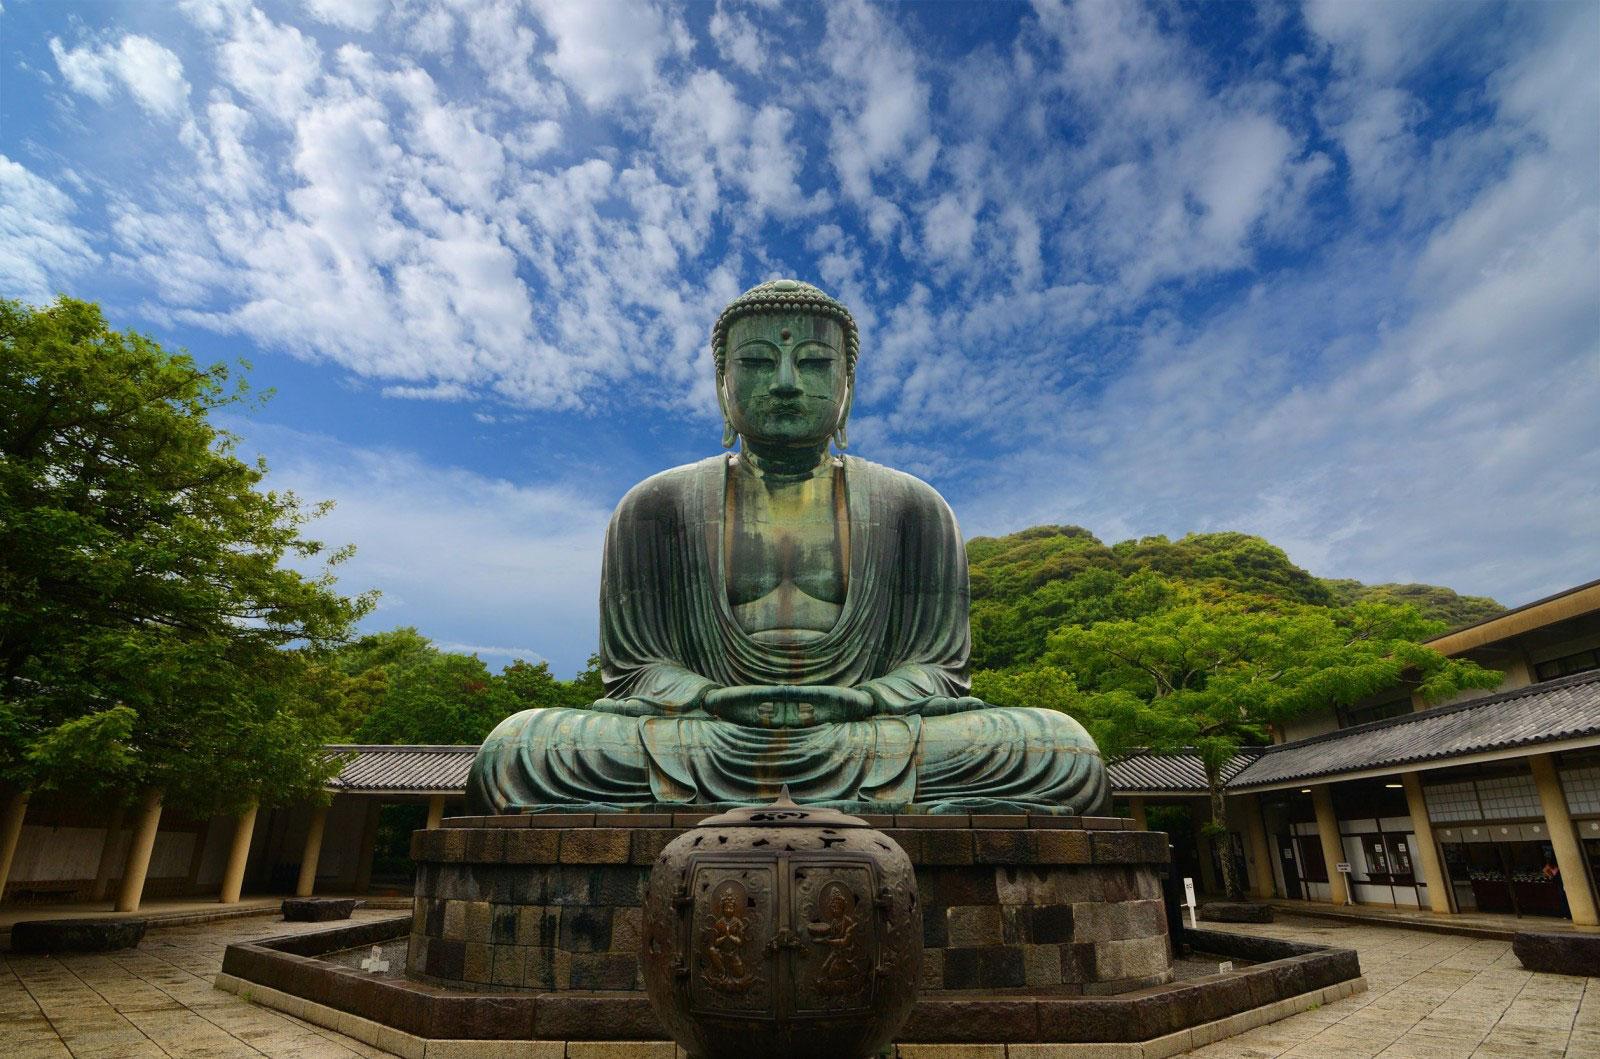 The-Great-Buddha-Daibutsu-Kotokuin-Temple-Kamakura-Japan